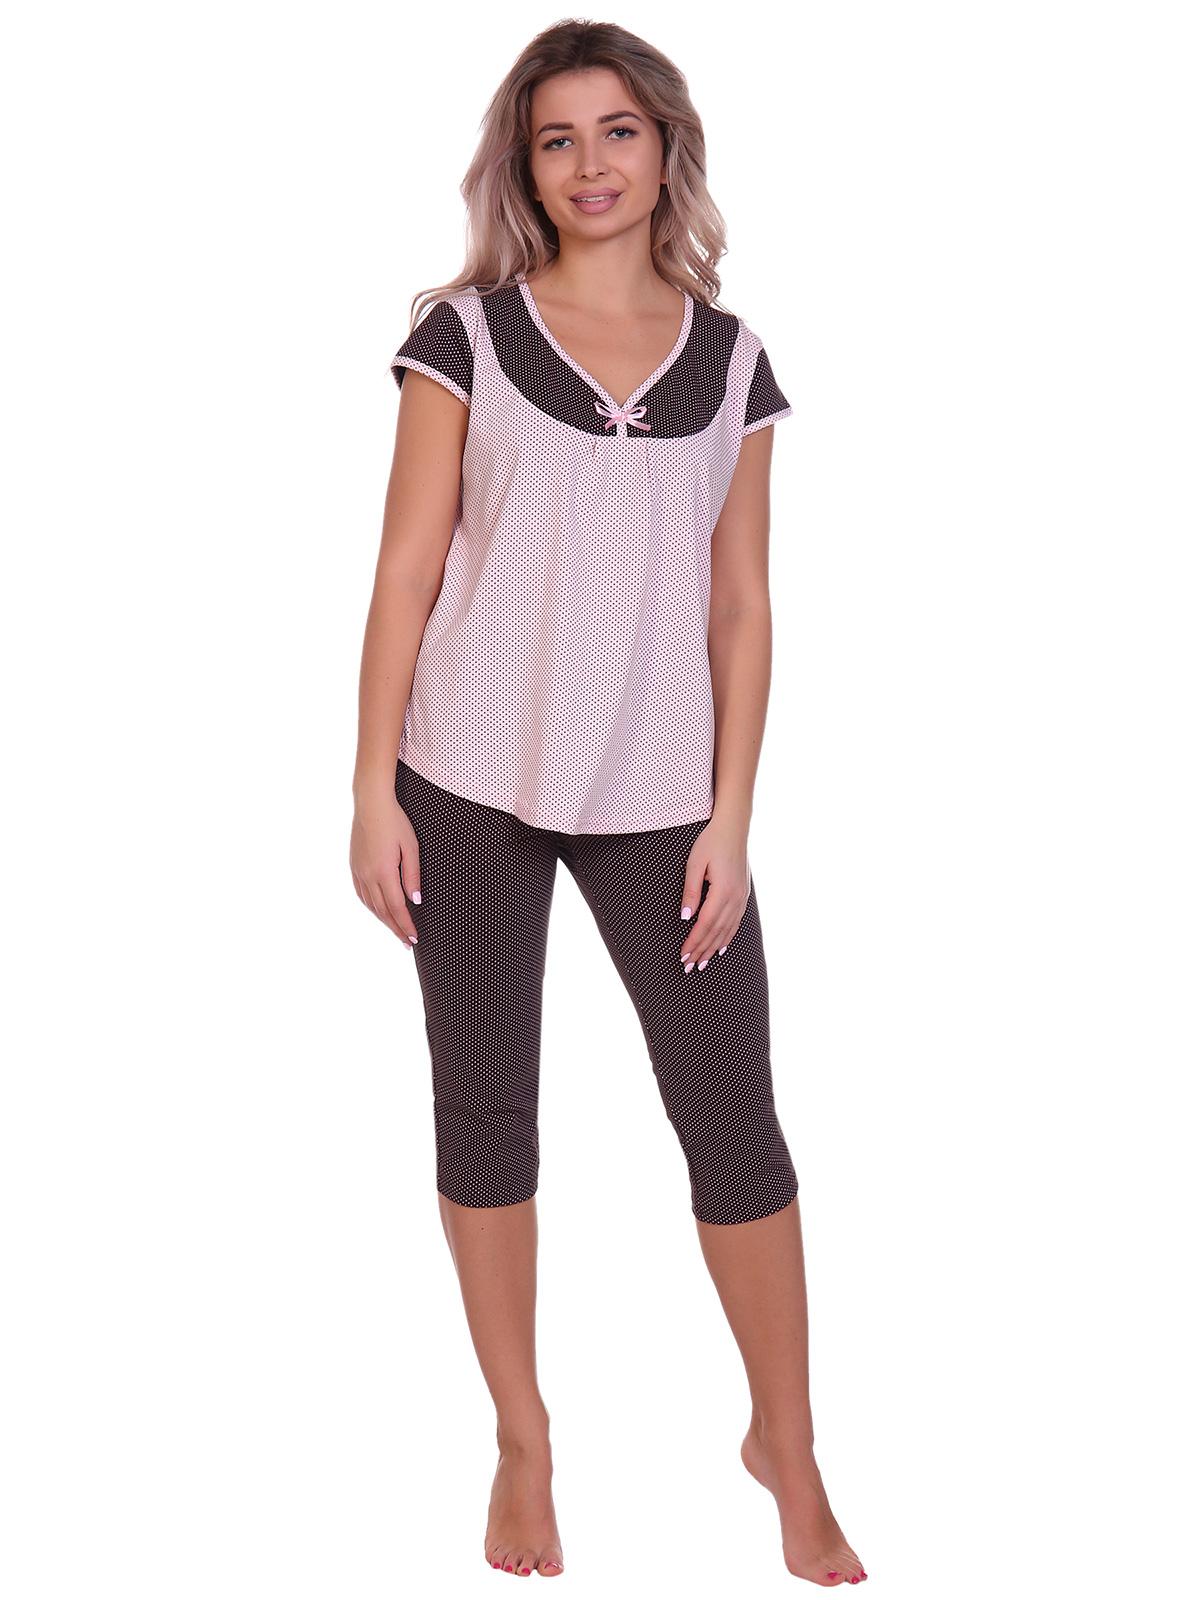 Жен. пижама арт. 16-0703 Розовый р. 46 НСД Трикотаж